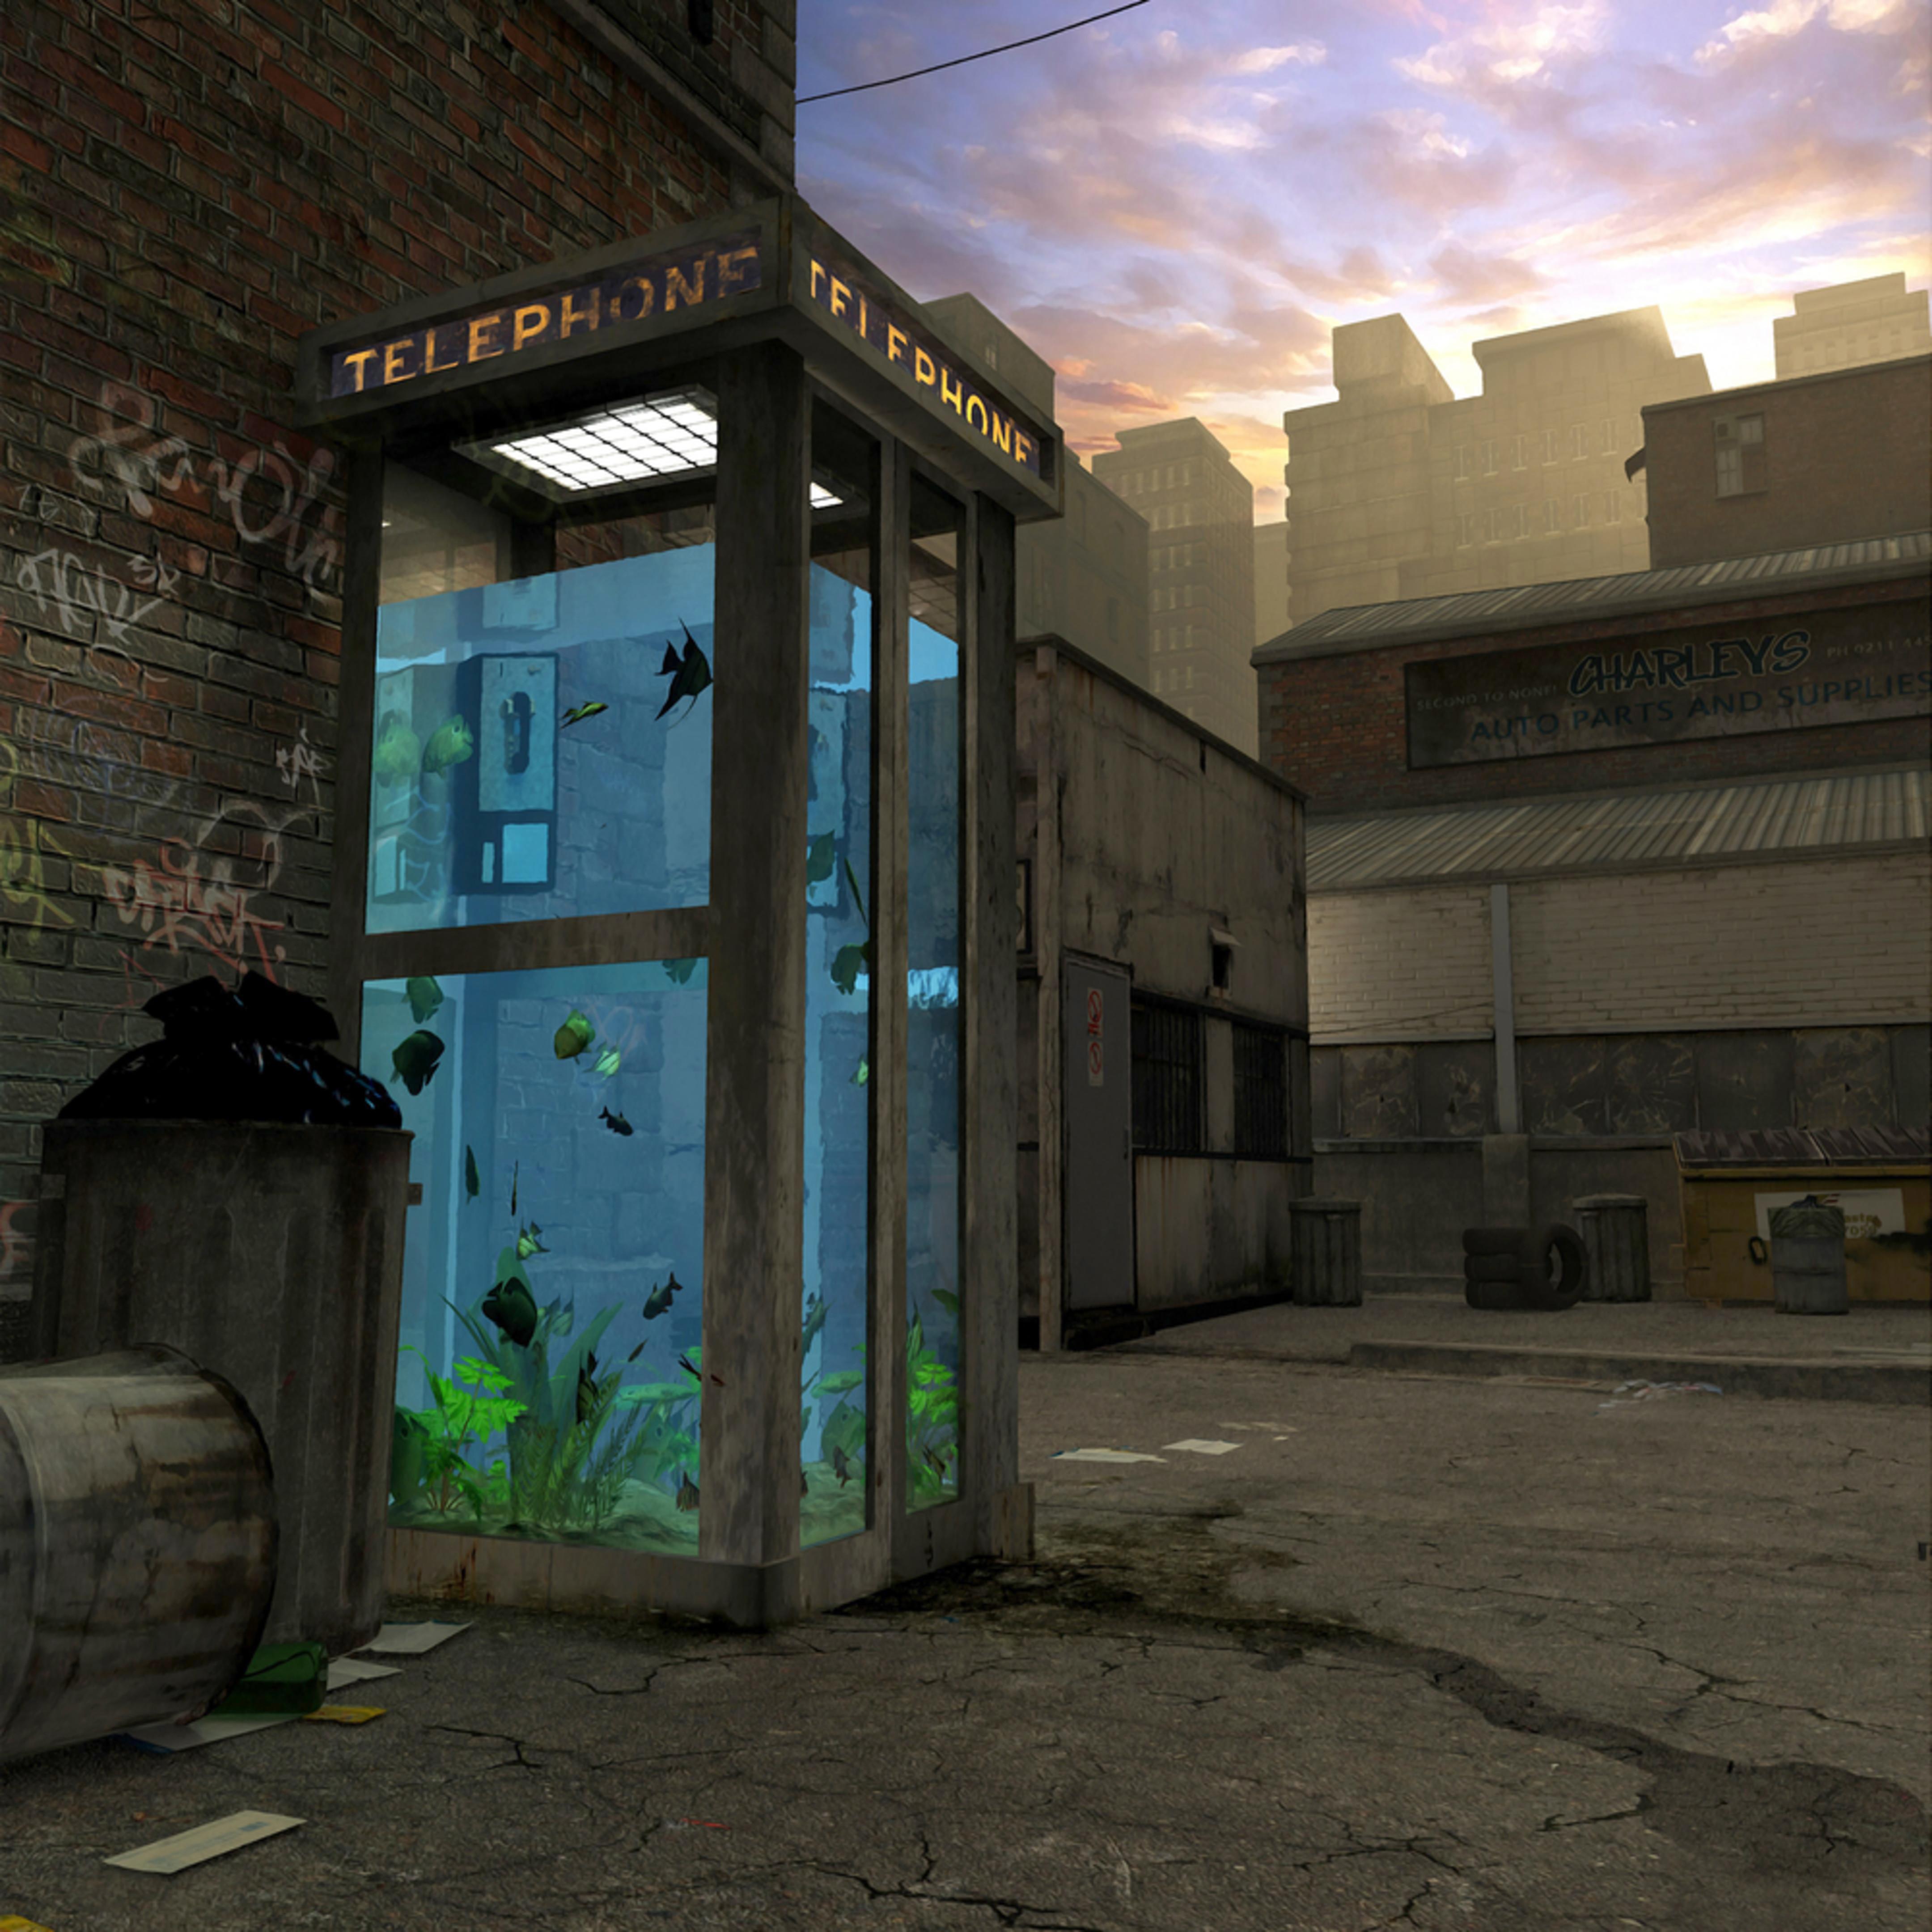 Cdecker phonebooth5760 sig qhofz5